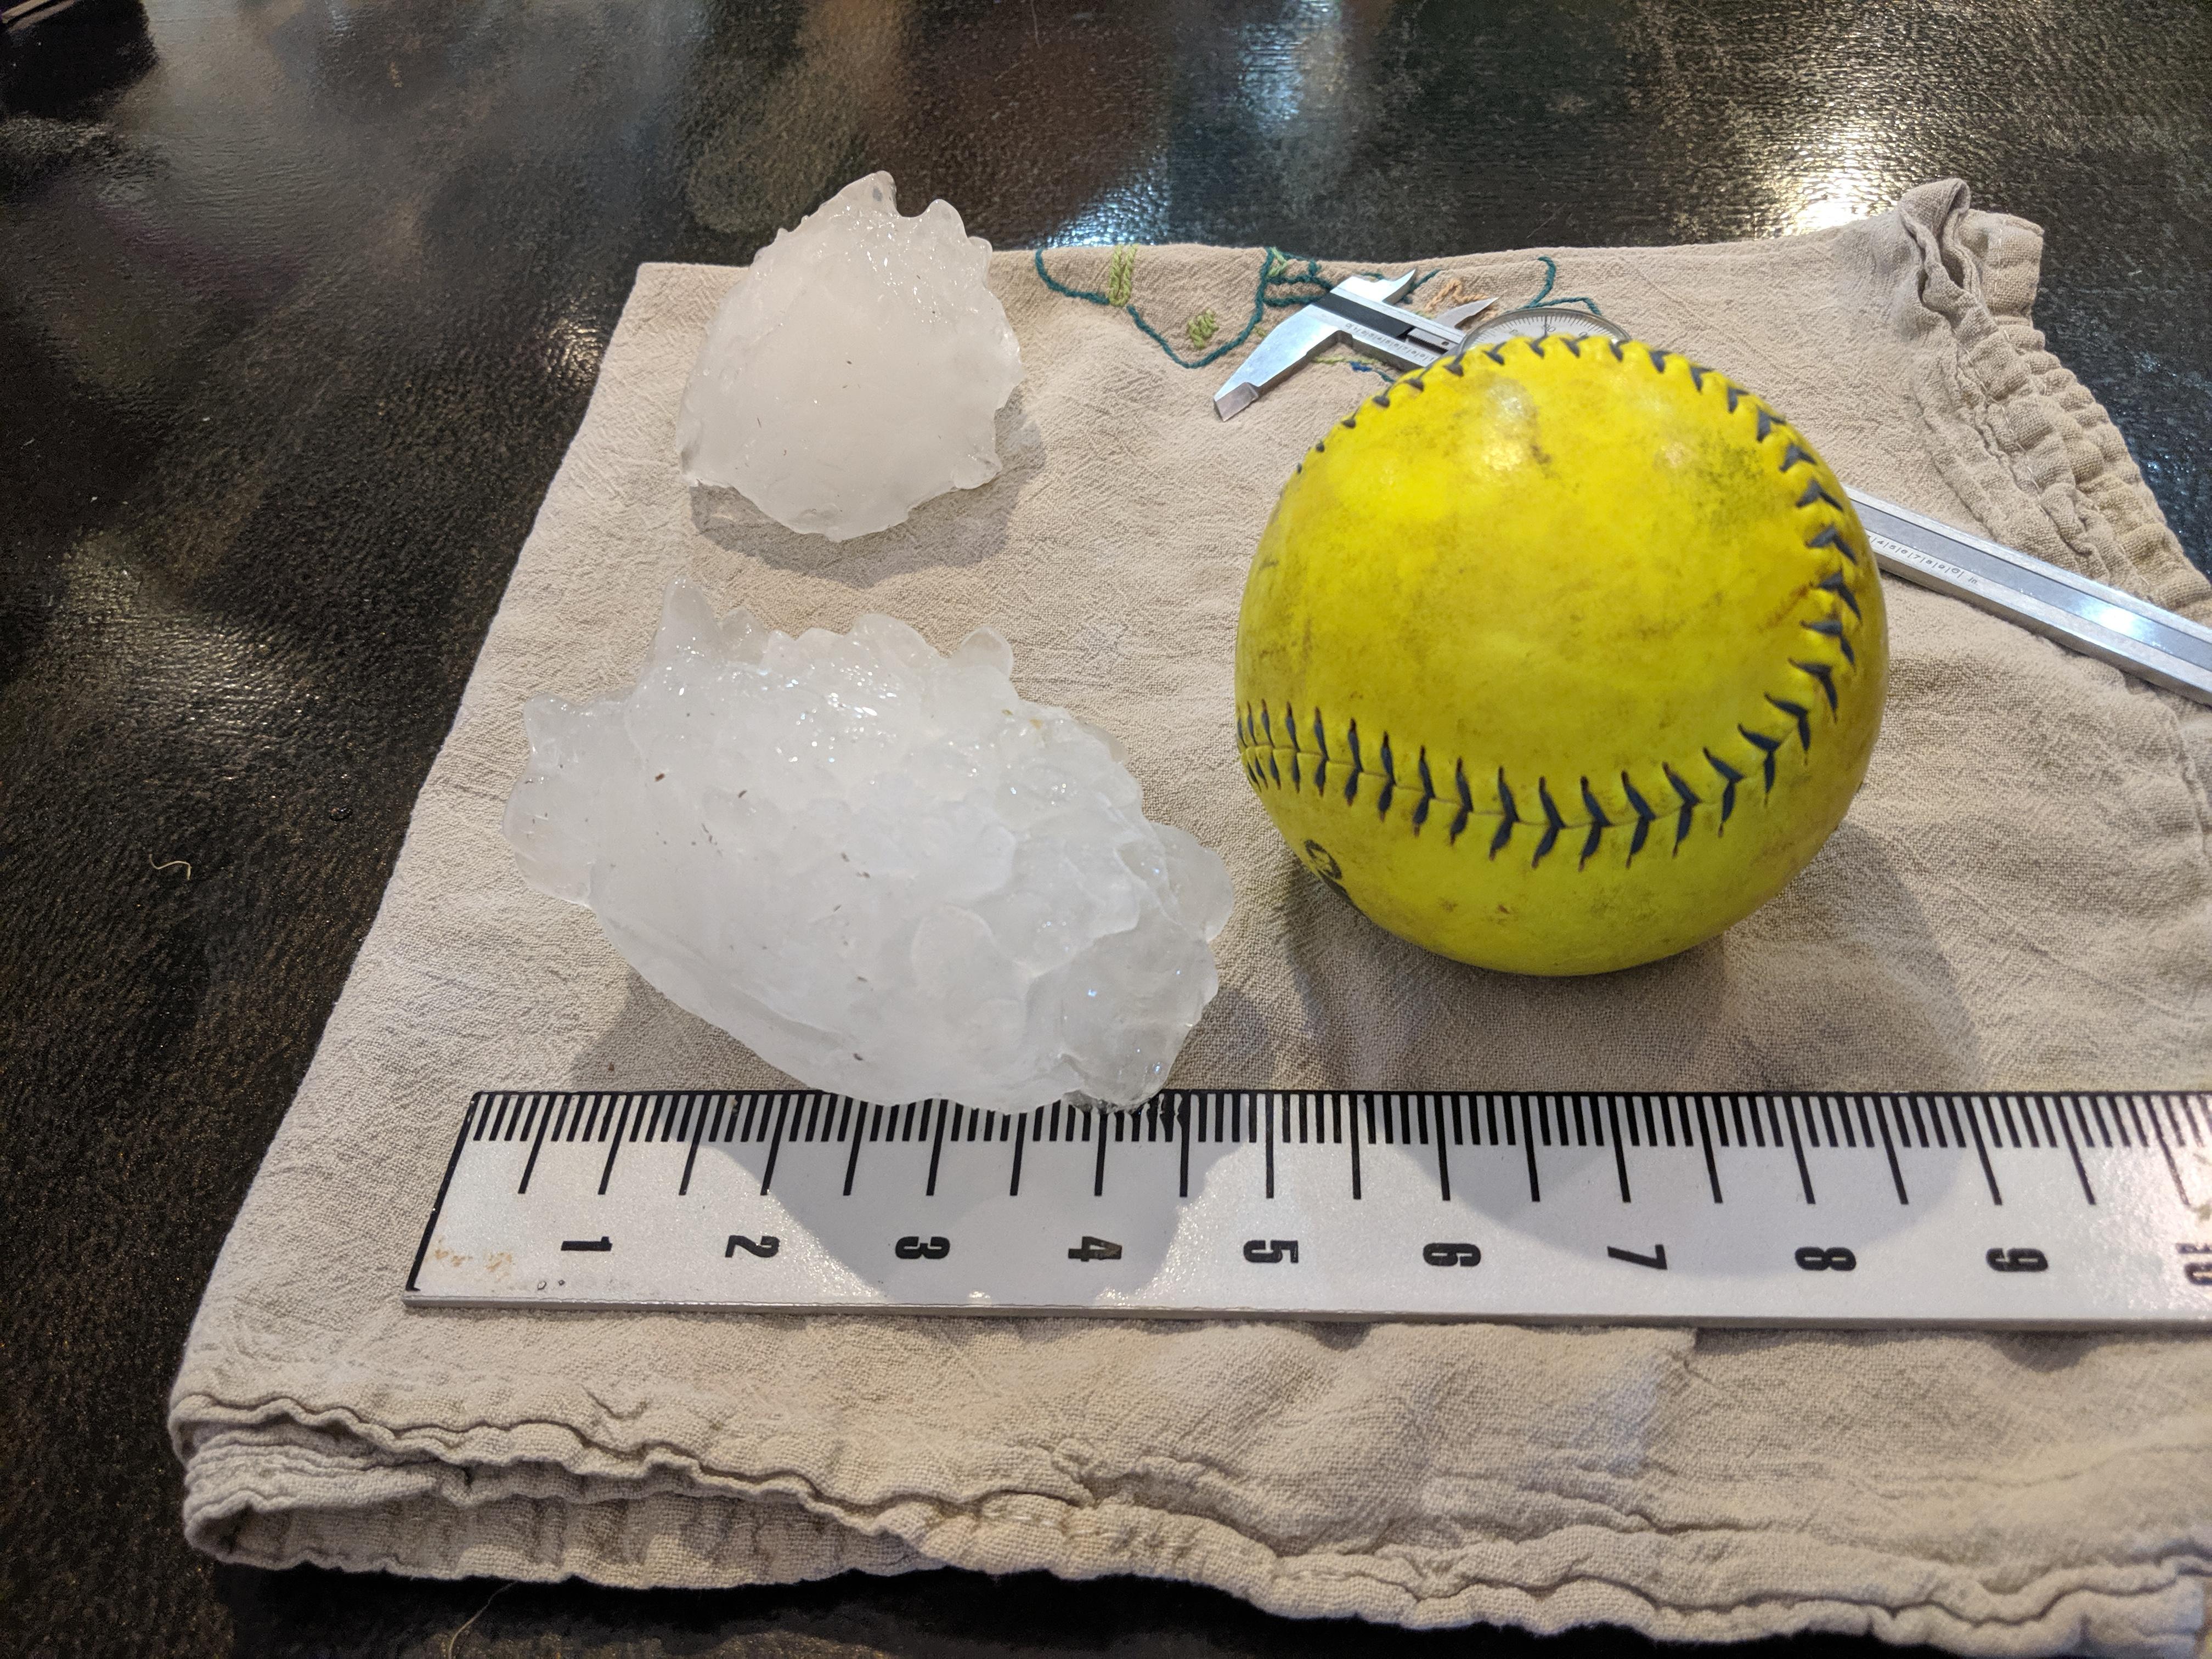 Colorado's record breaking hail stone